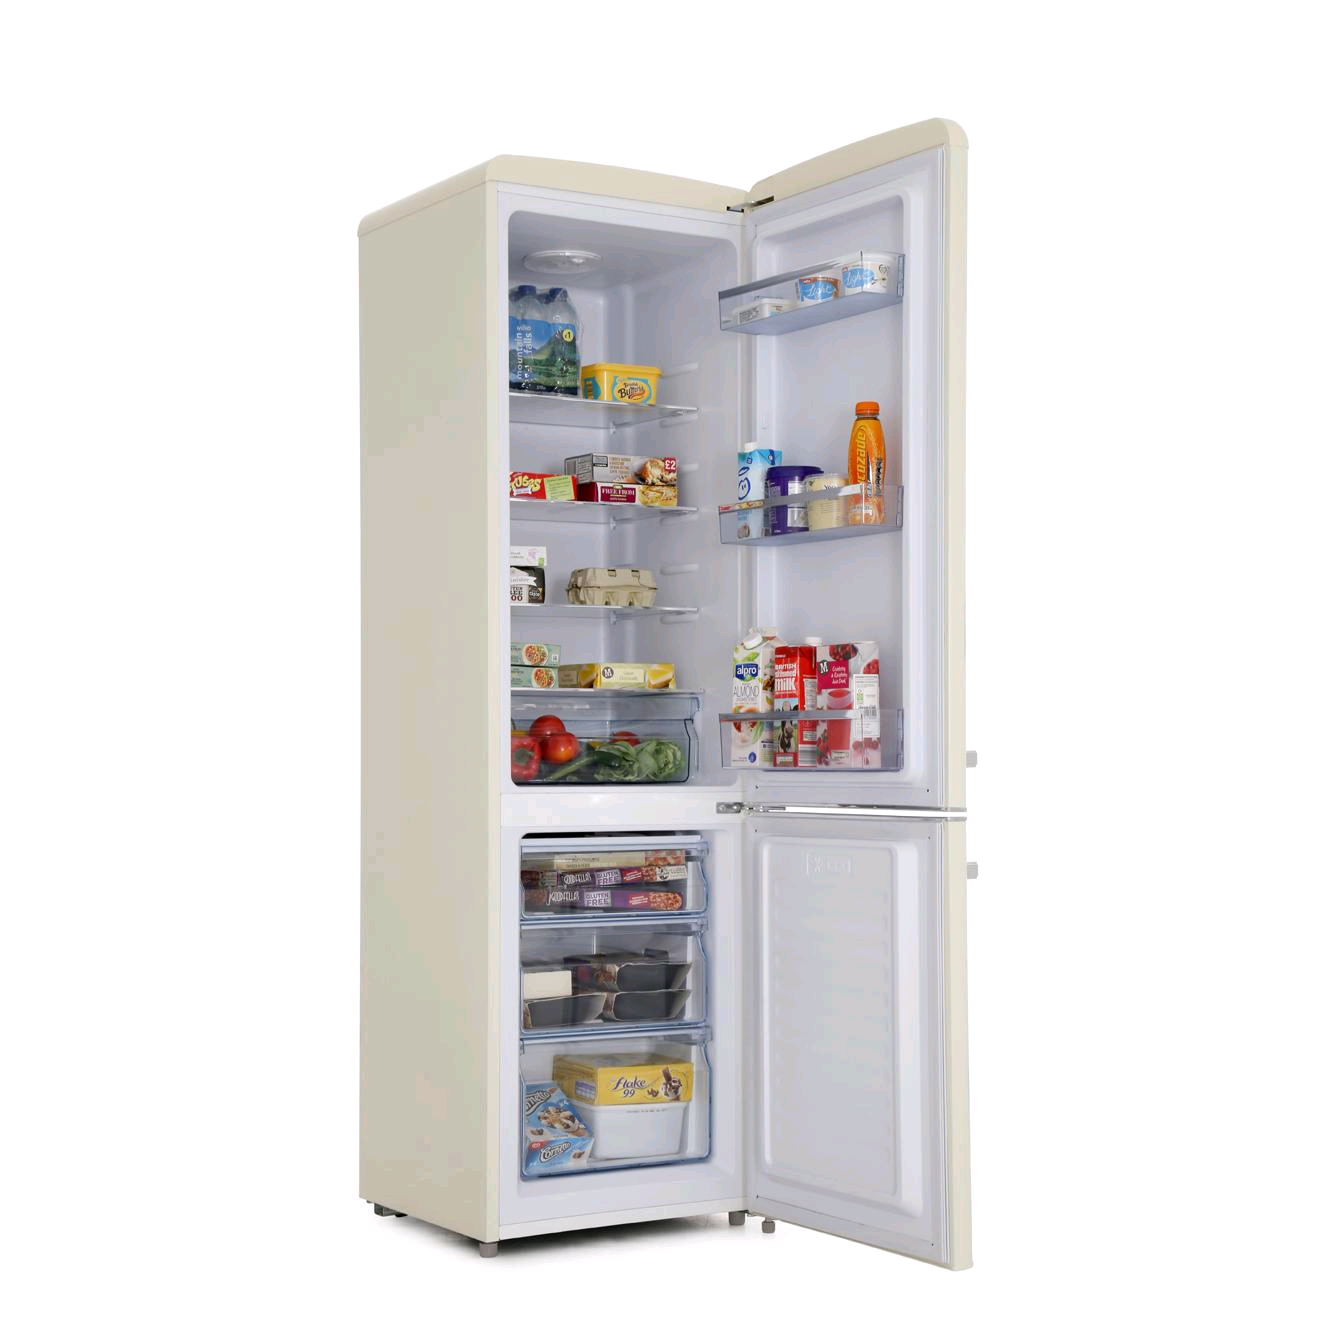 Amica FKR29653C Retro Cream Fridge Freezer Manual Defrost 181litre net fridge/63litre freezer Height 181 W 55 D 61.5